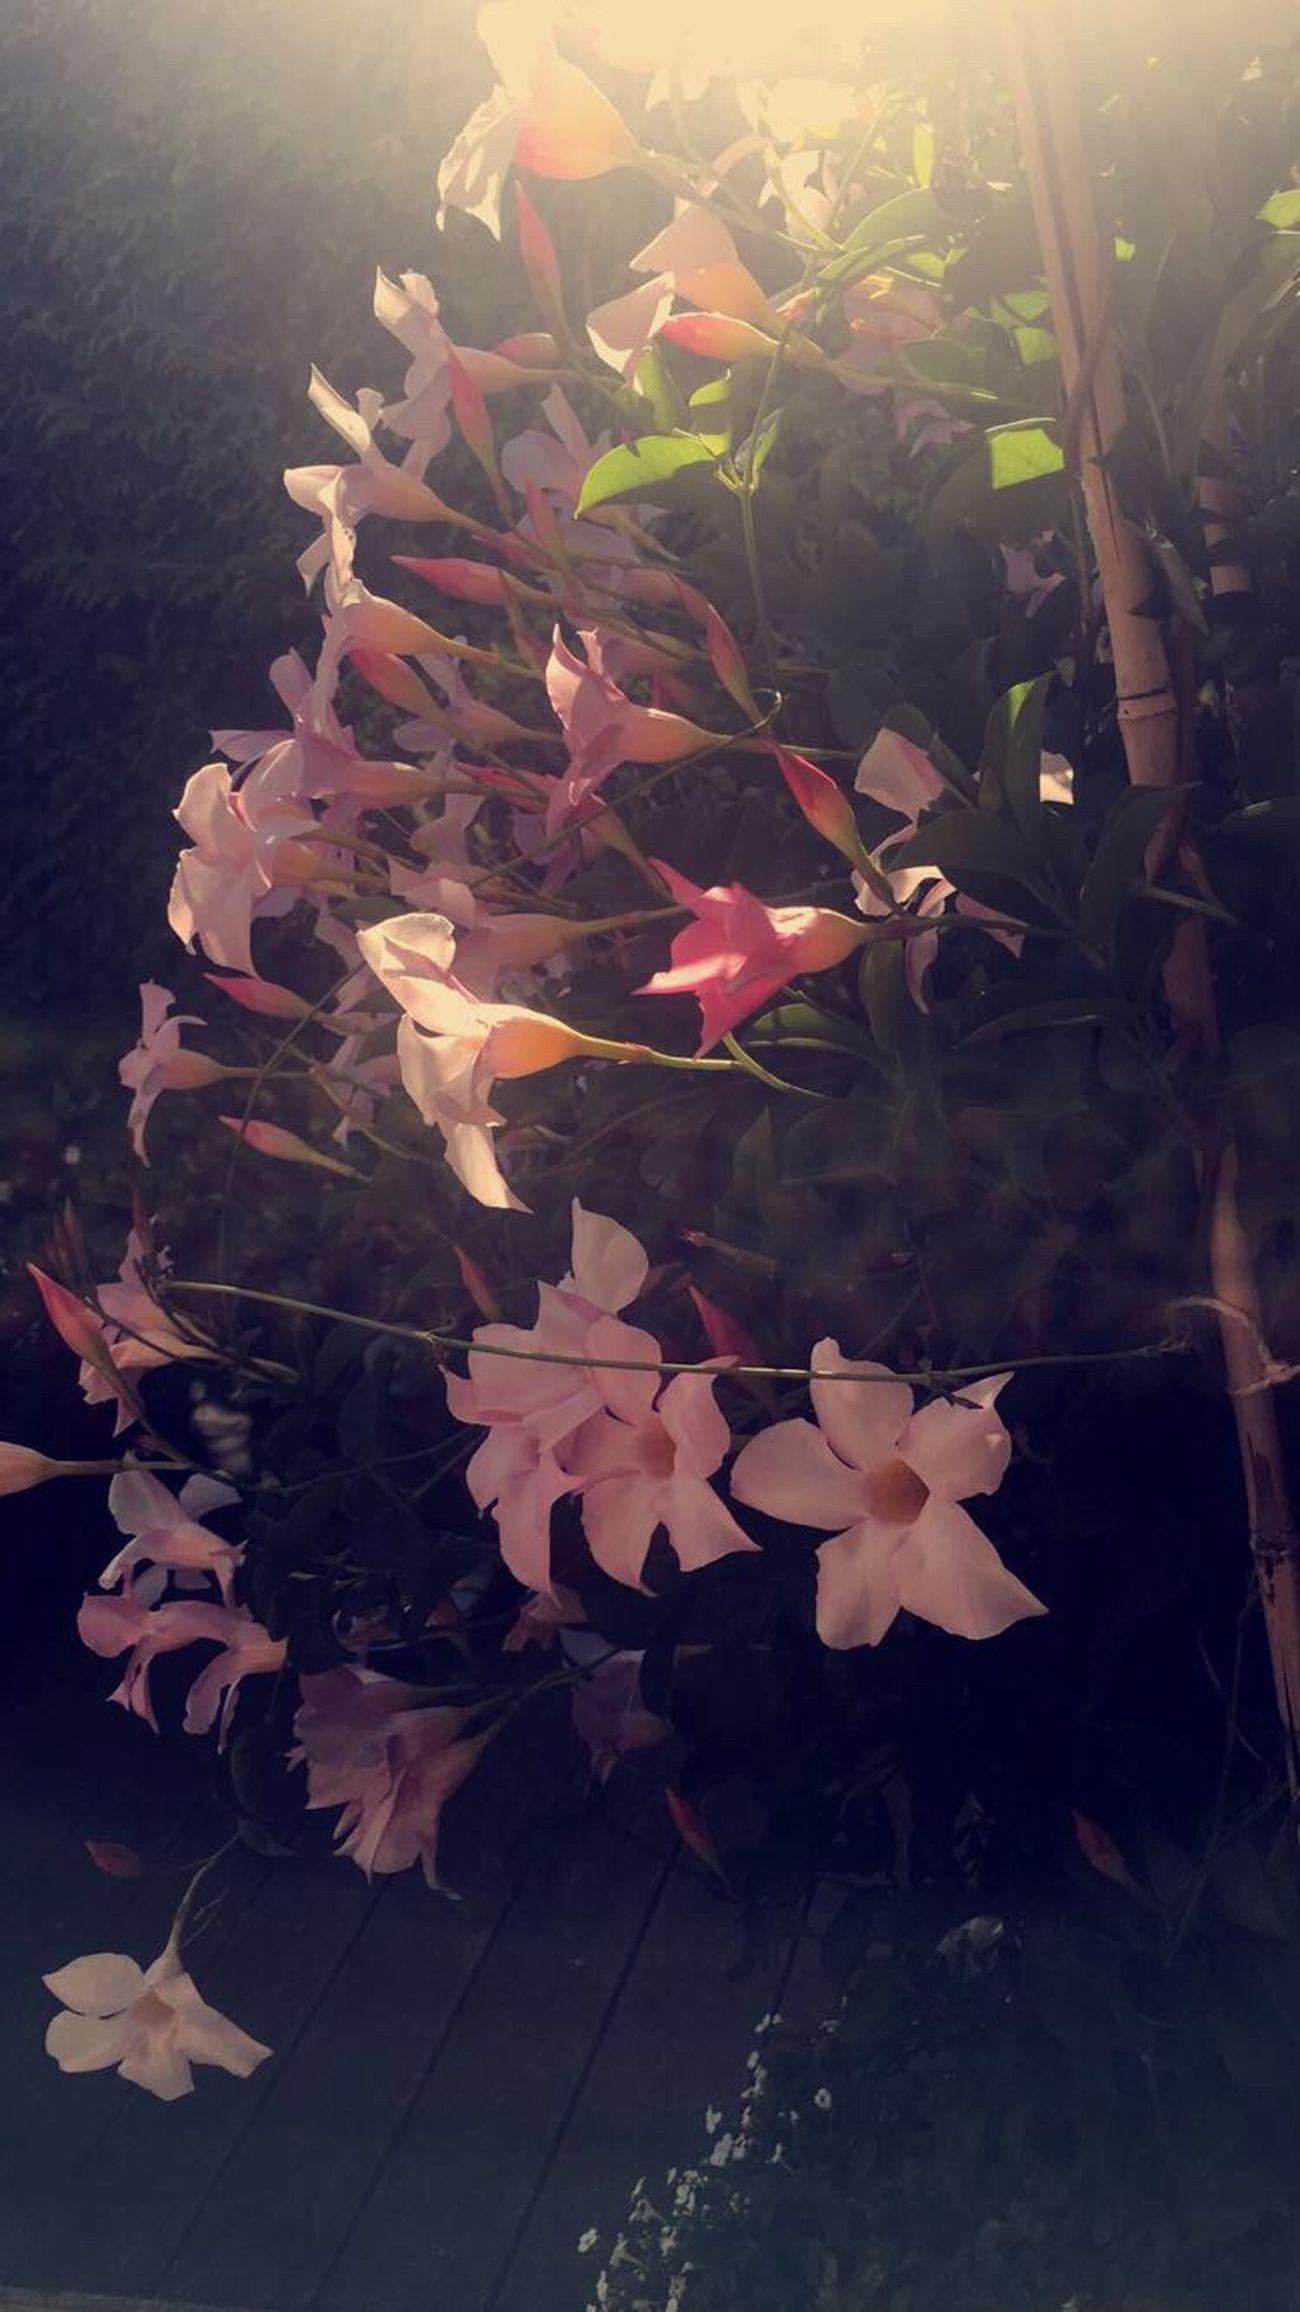 Garden Flowers Flower Snapchat Me 👉🏻 lifewithlorena Photography Flowerporn Nature Pink Love Snapchat 👉🏻 lifewithlorena Enjoying Life Summer IPhoneography Hey✌ Like4like Home Photo C4c POTD Polish Followme Follow Snap 👉🏻 lifewithlorena Europe Iphonesia